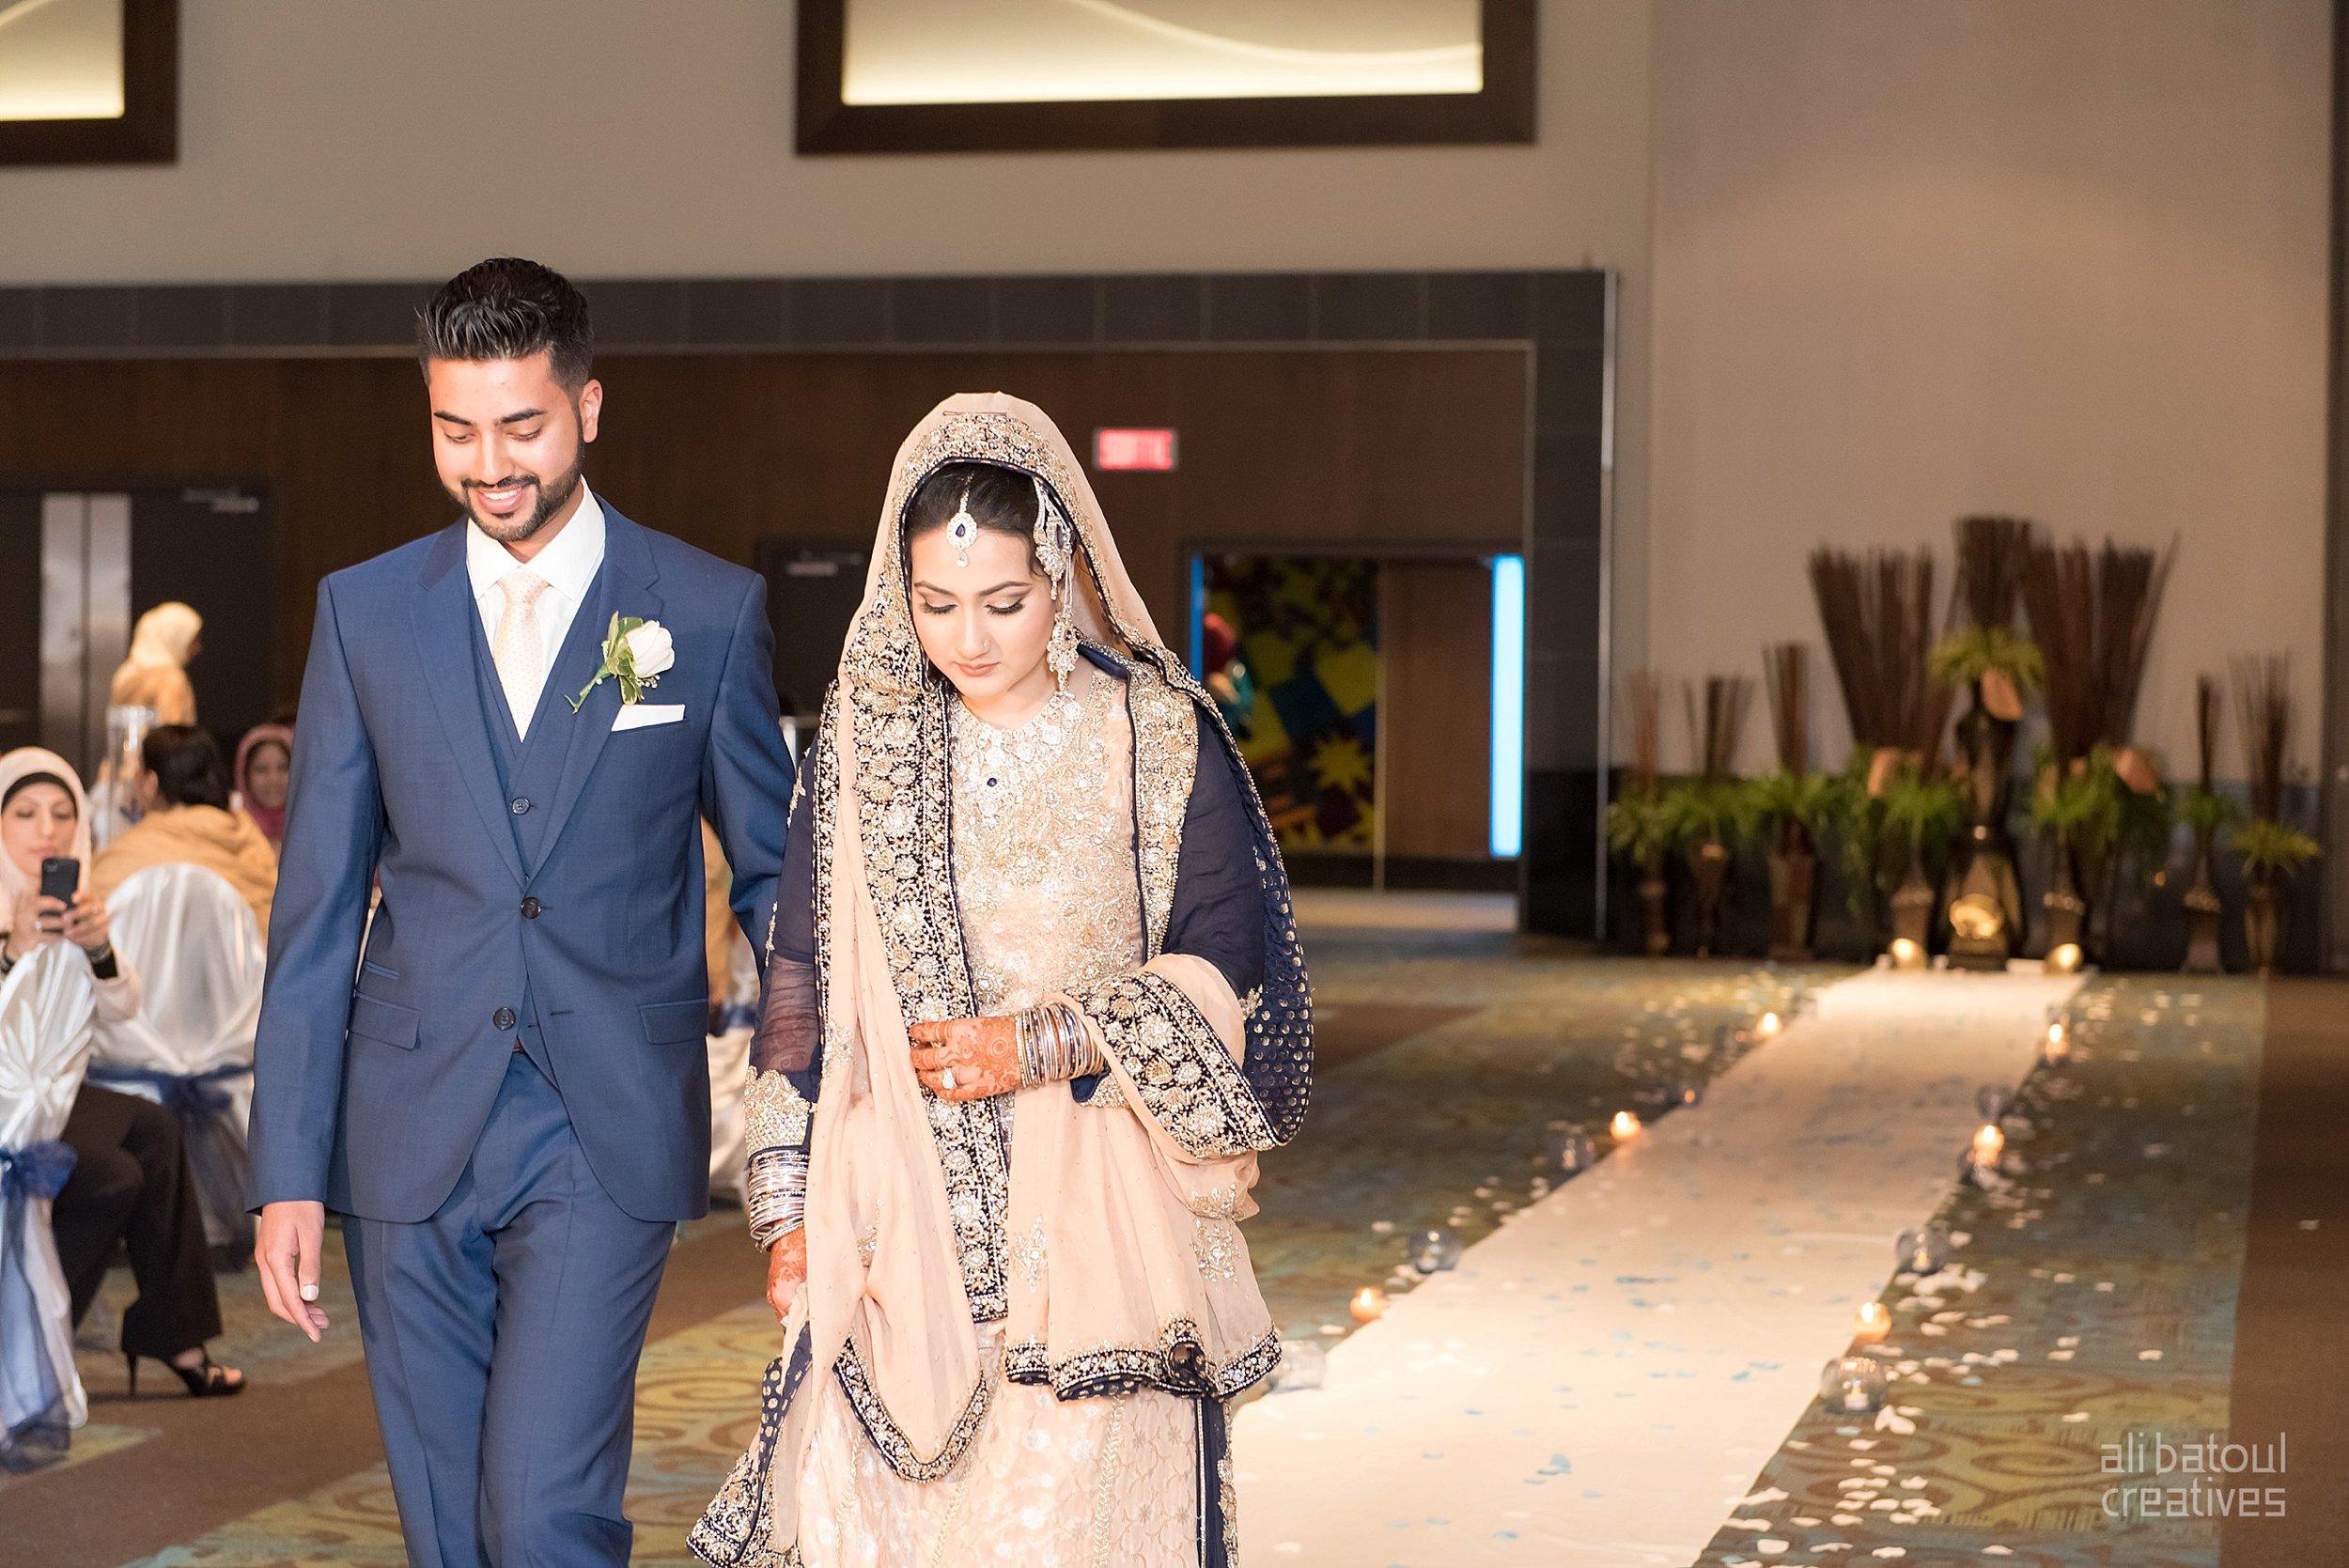 Alina + Mahmood - Ali Batoul Creatives Blog-97_Stomped.jpg